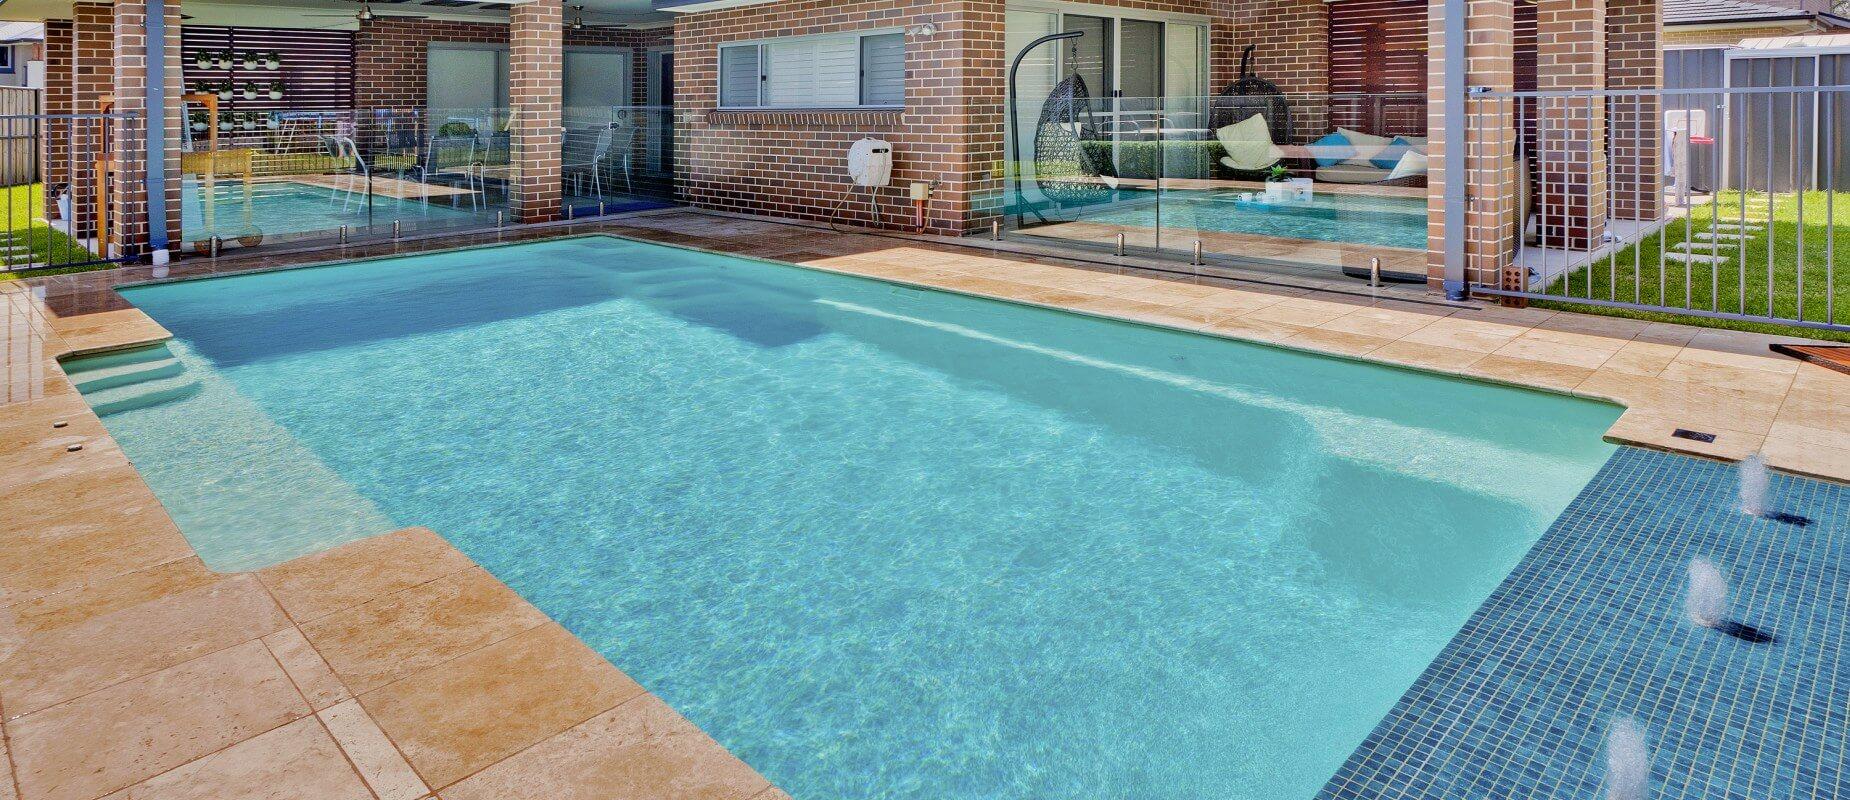 piscina de lux modele frumoase 32